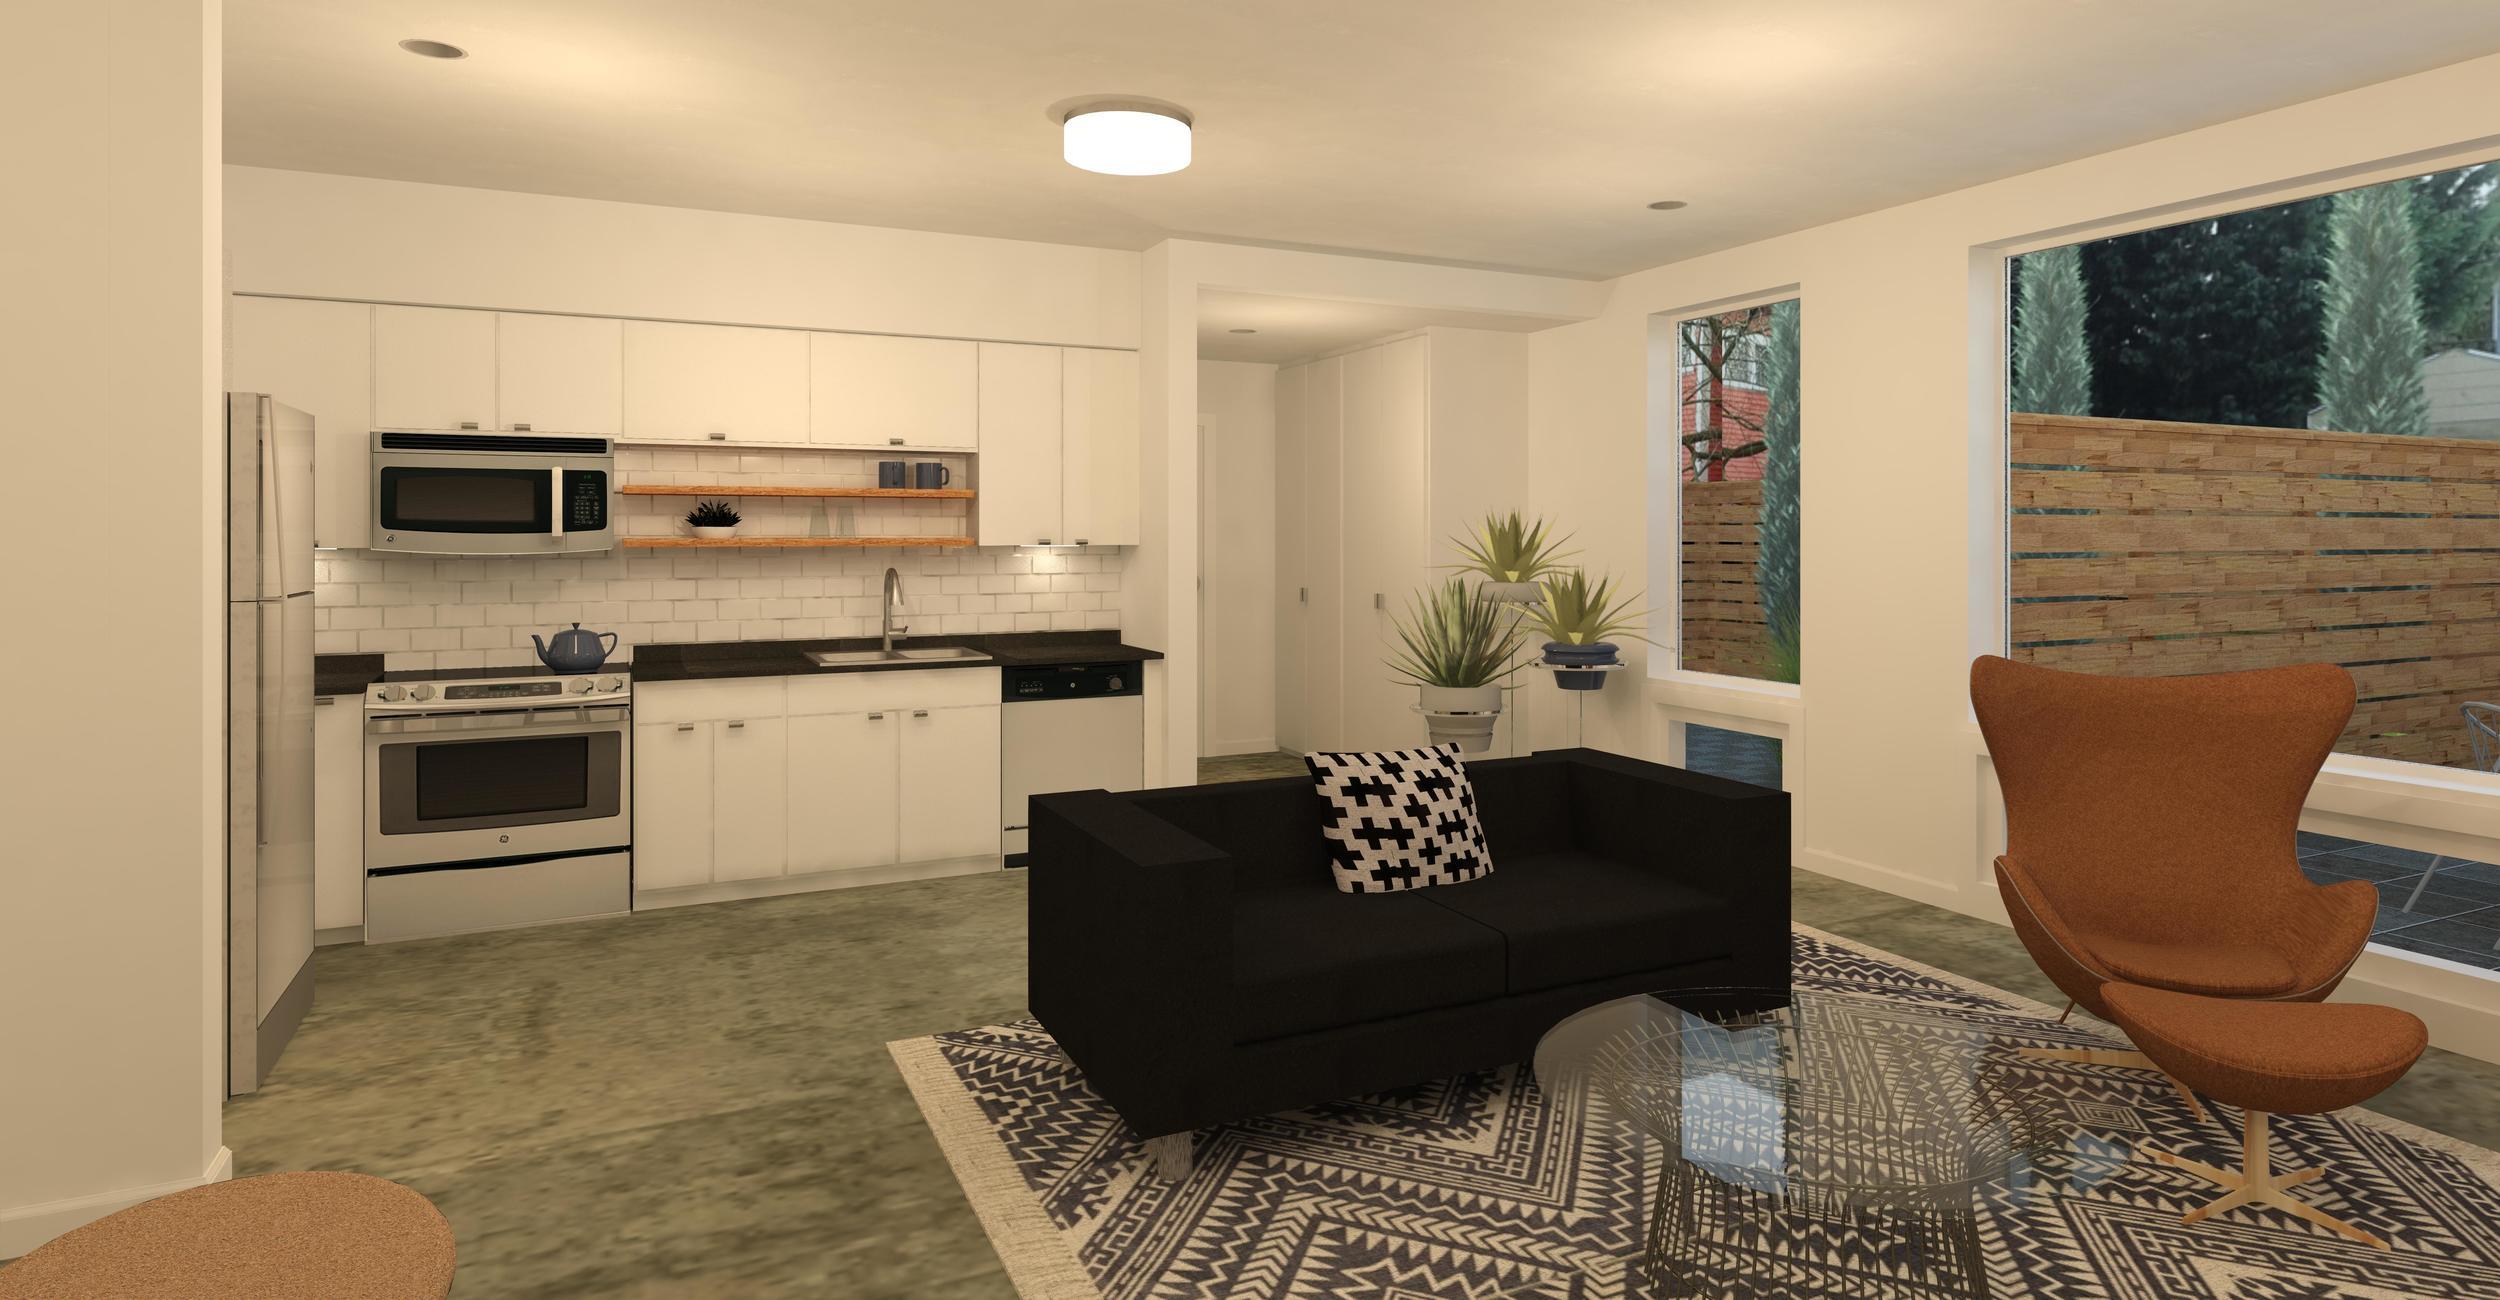 Wide Living Room Patio View - D 600dpi7.1.jpg